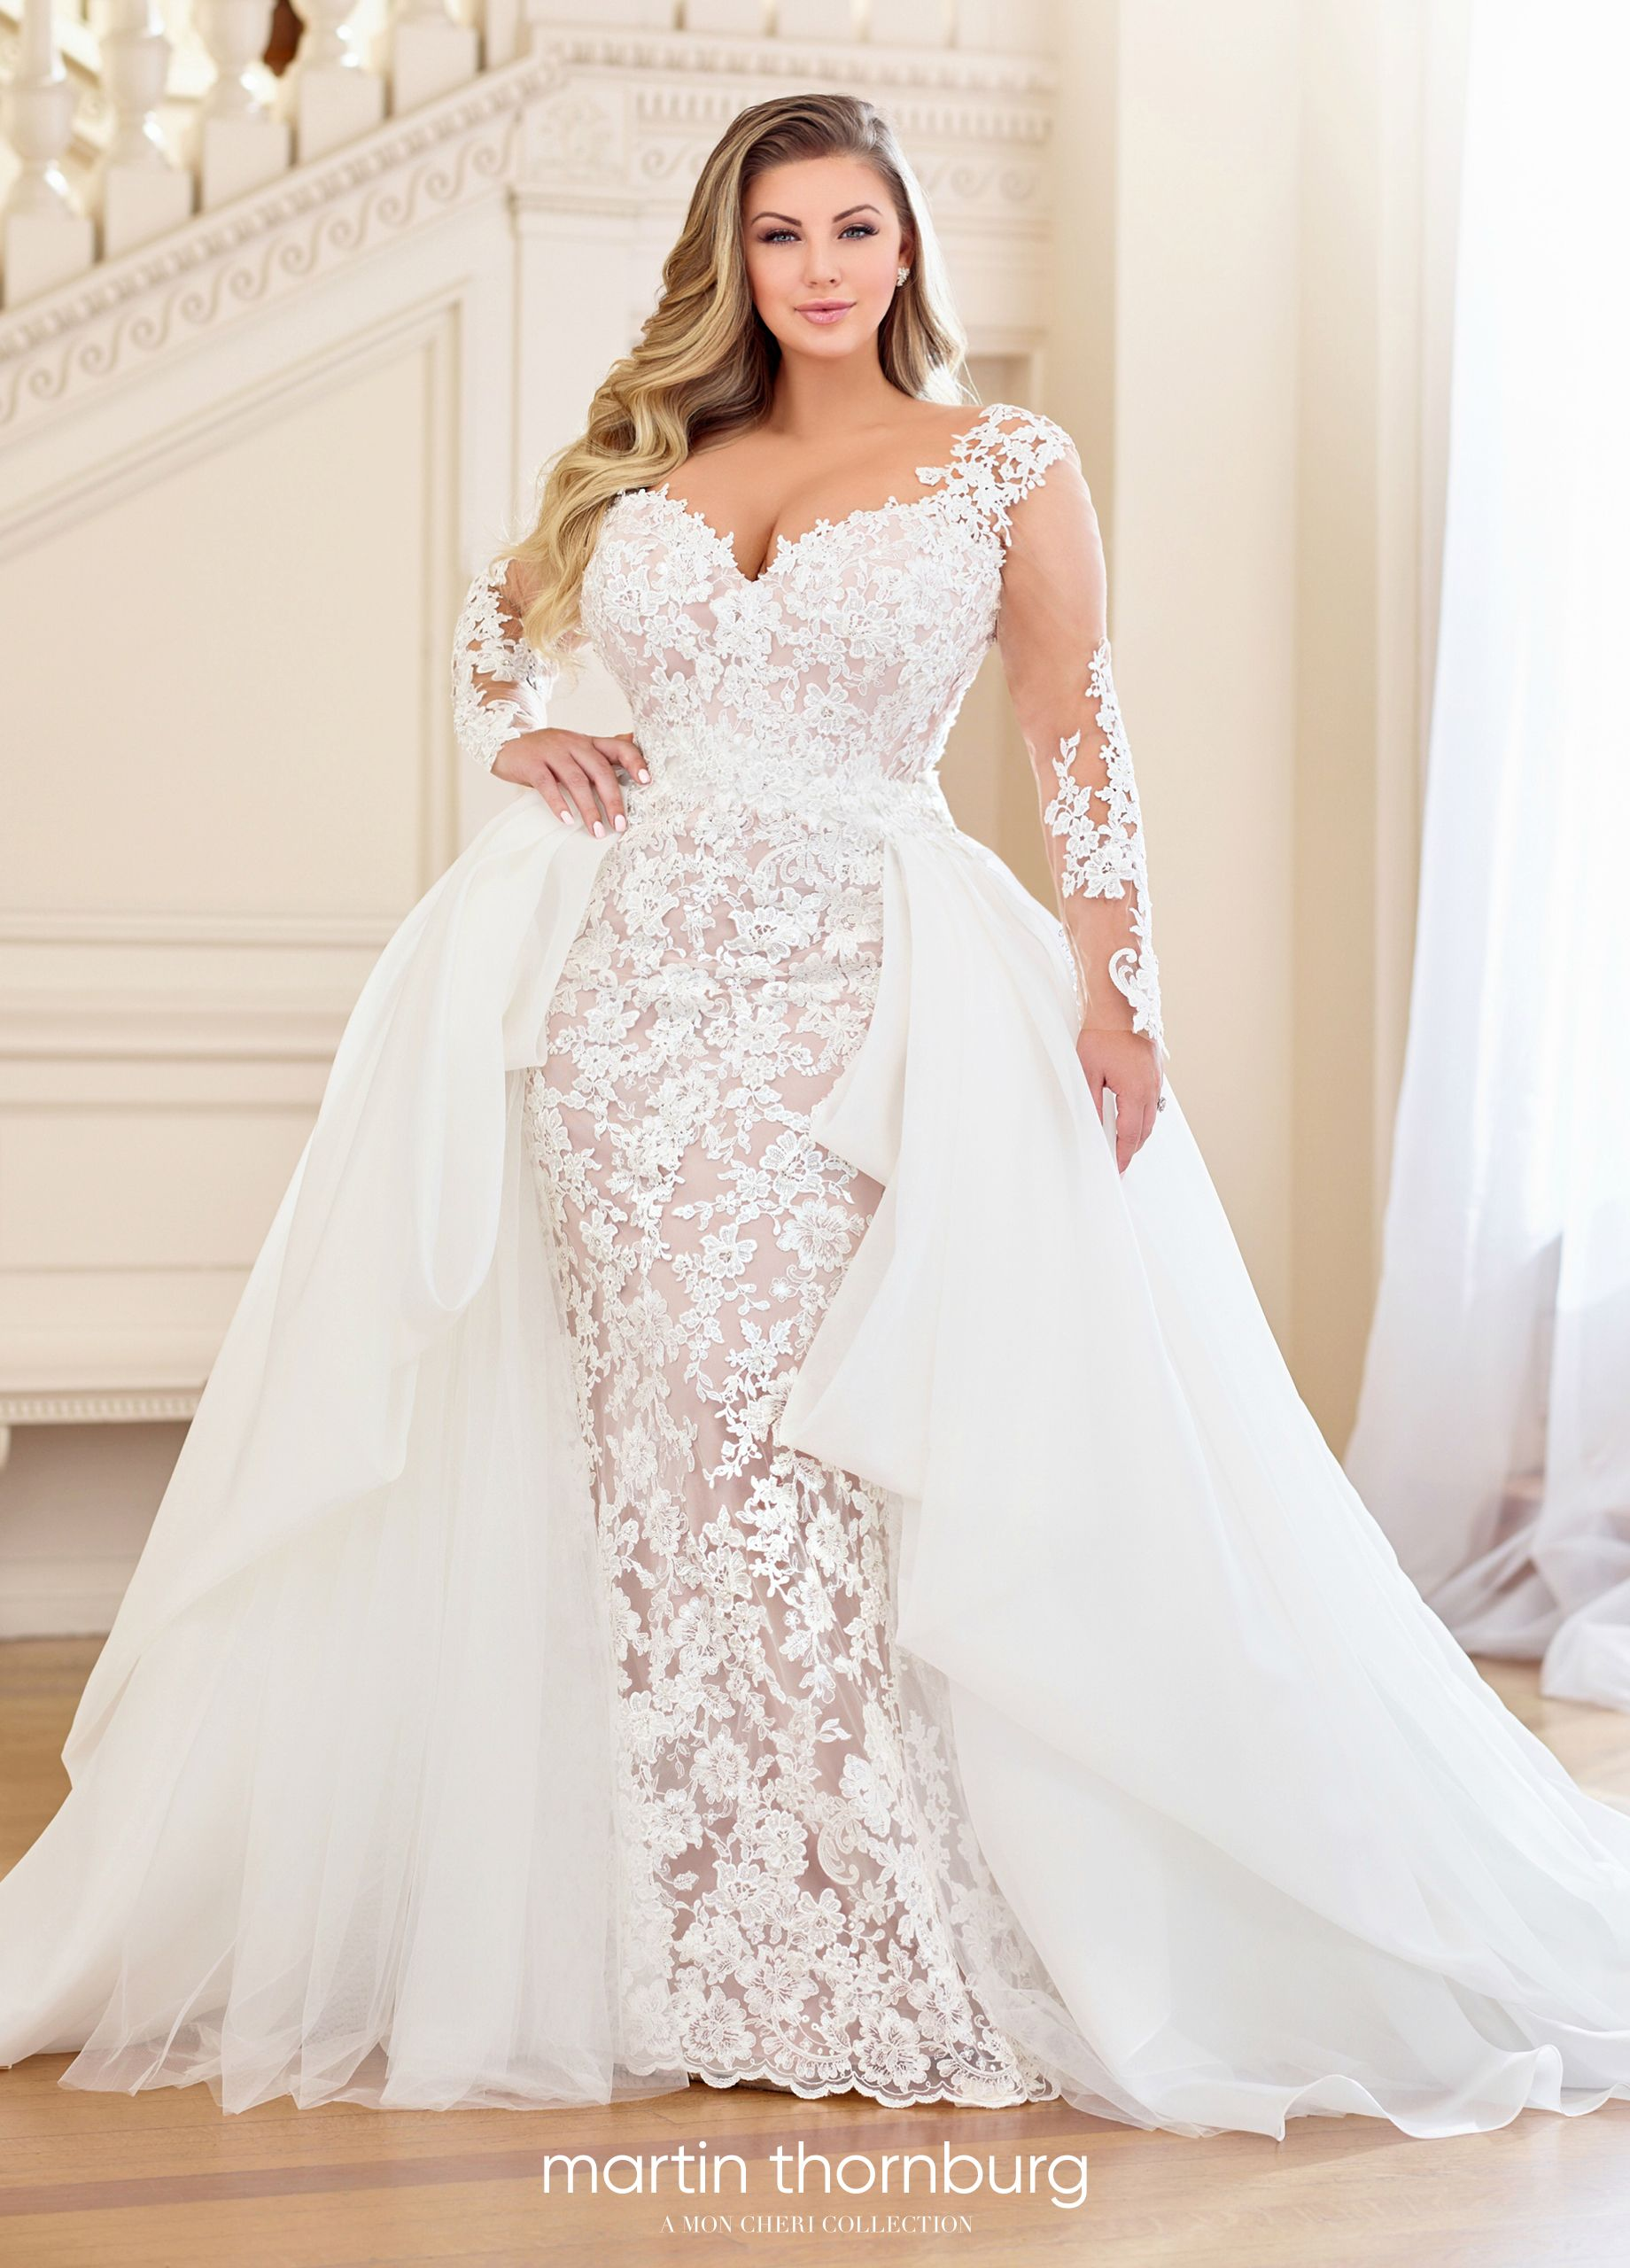 Martin Thornburg Dolores Detachable Train Wedding Dress Wedding Dresses Plus Wedding Dresses